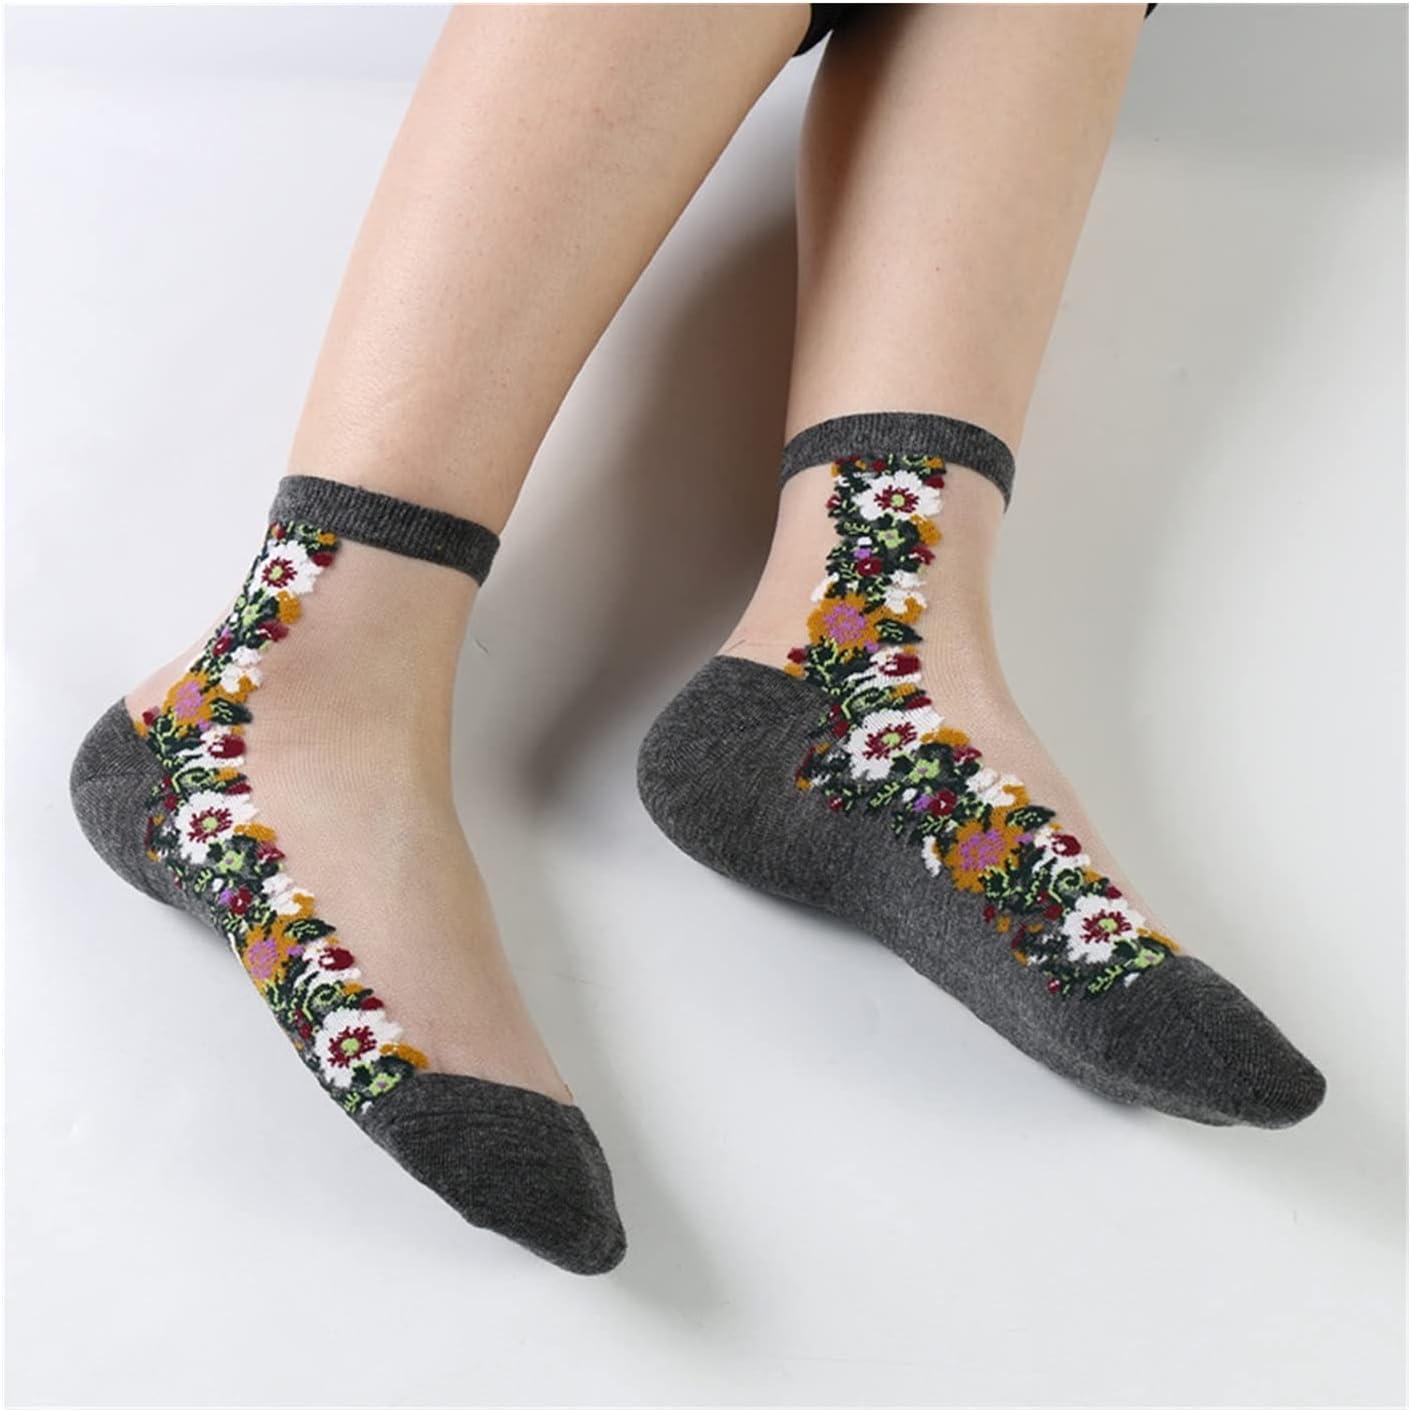 Moonlight Star Spring Summer Thin Glass Mesh Socks Women Ankle Floral Fishnet Cotton Transparent Socks (Color : Style C)